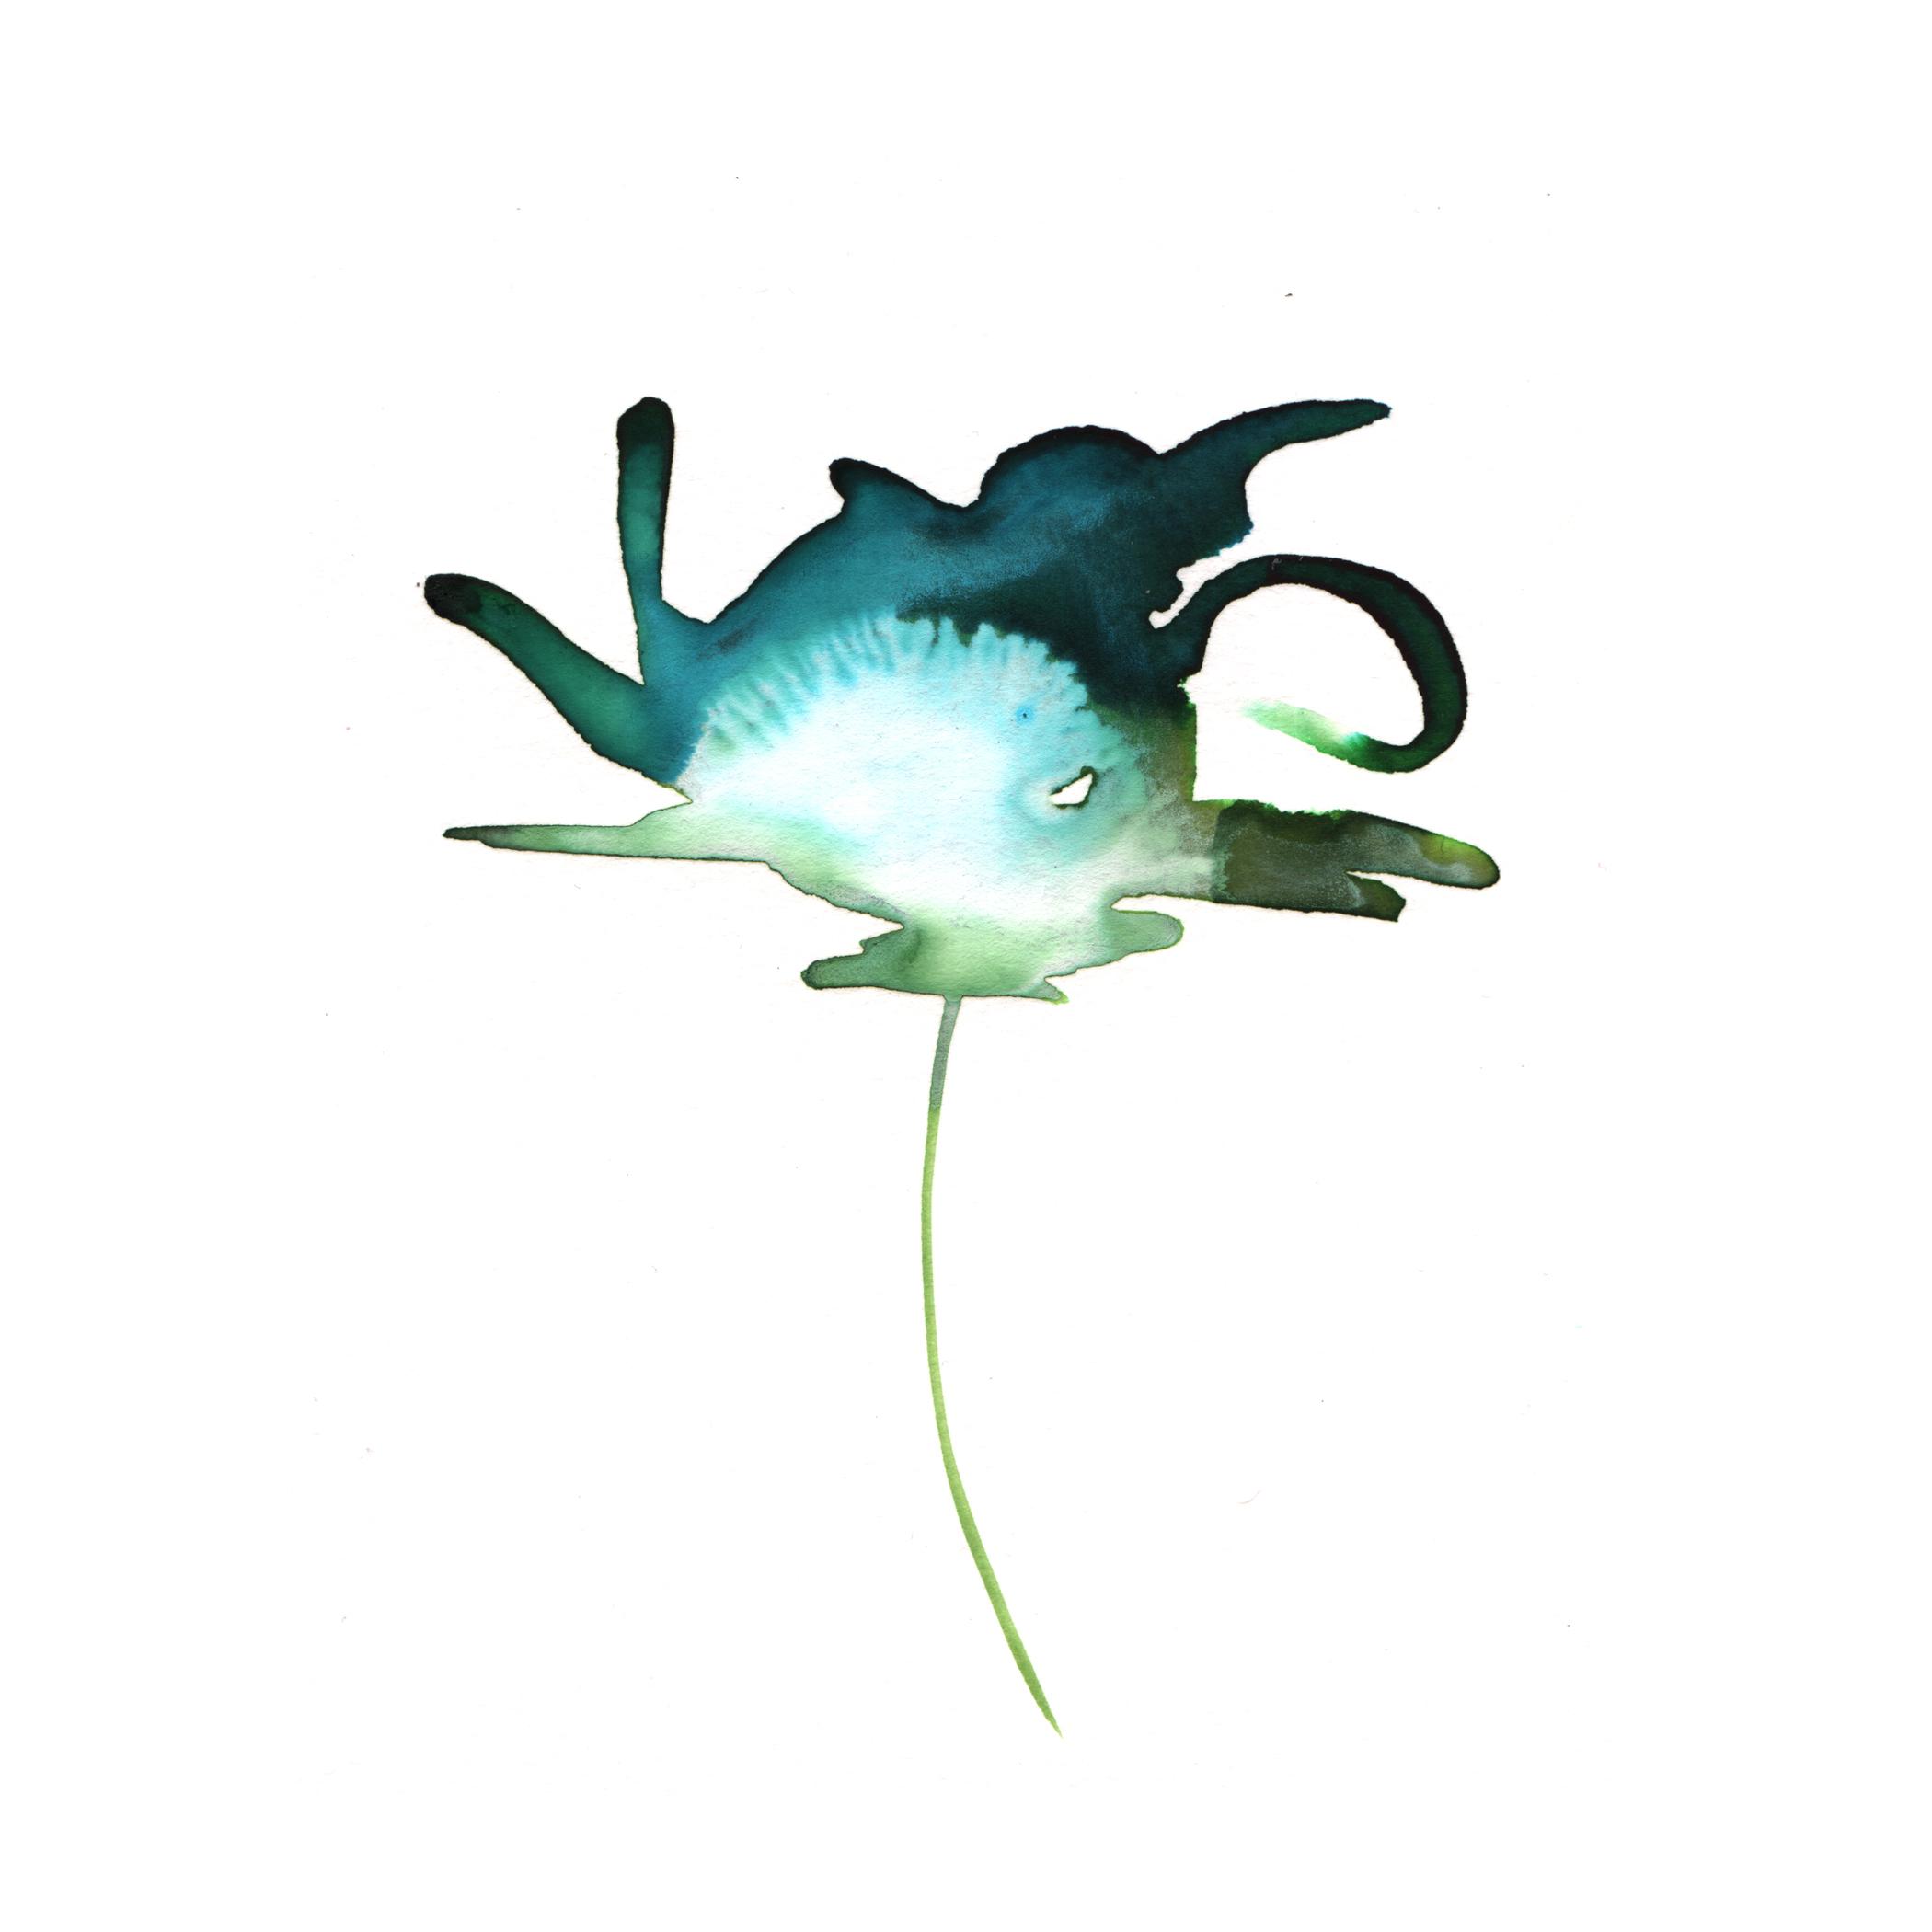 59.Lily.Pad.4.8.14.jpg